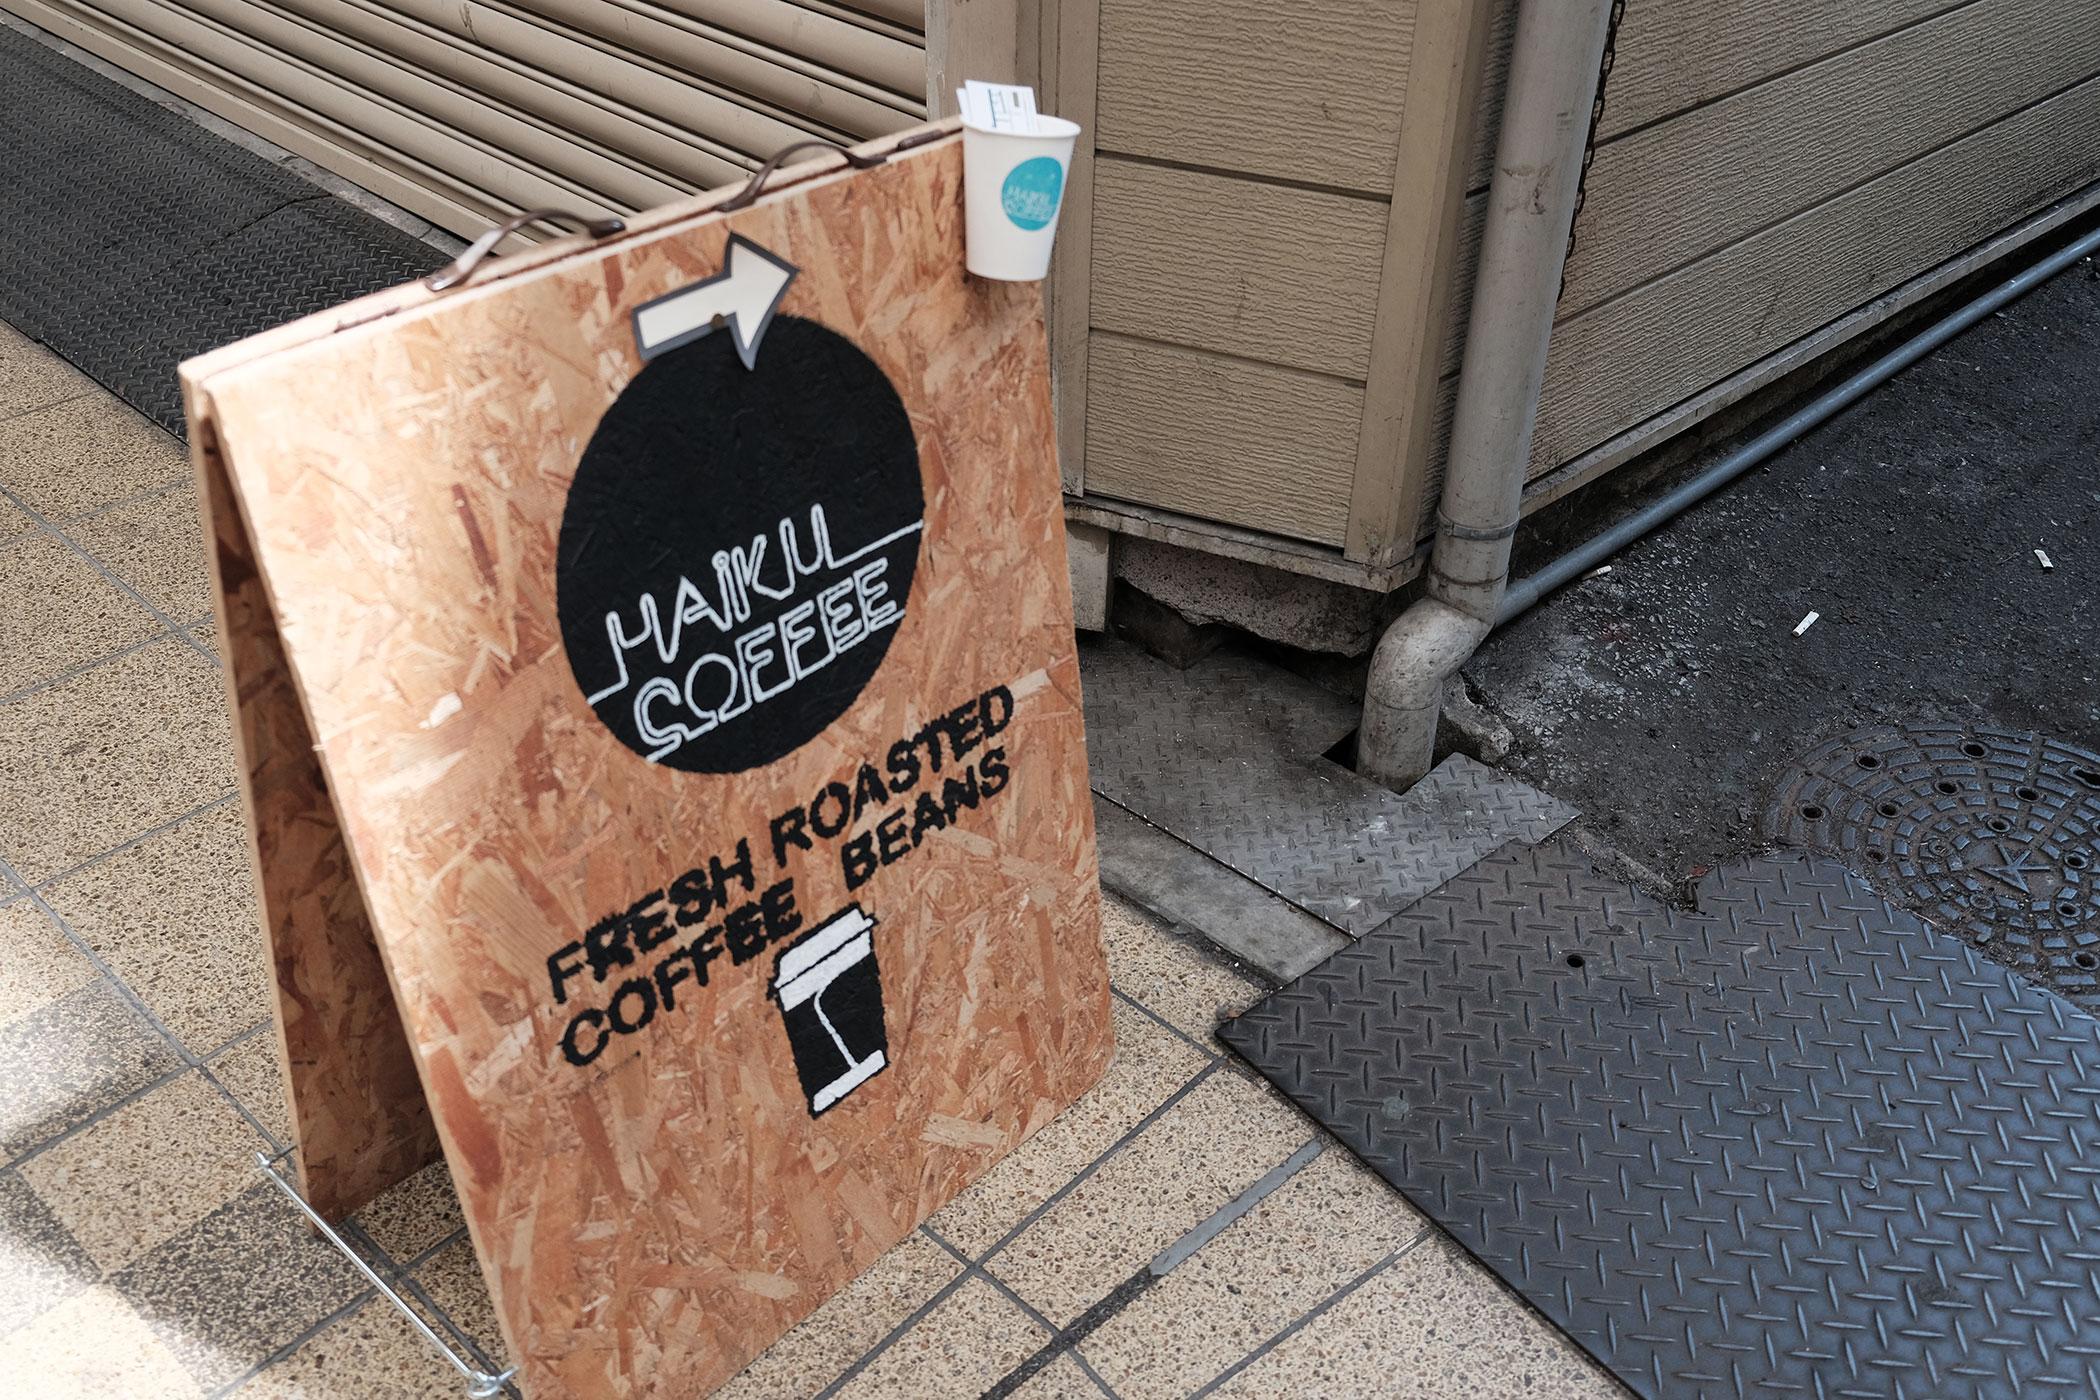 HAIKU COFFEE ROASTERS コーヒーを愛するご夫婦による新店 - 大阪・中崎町